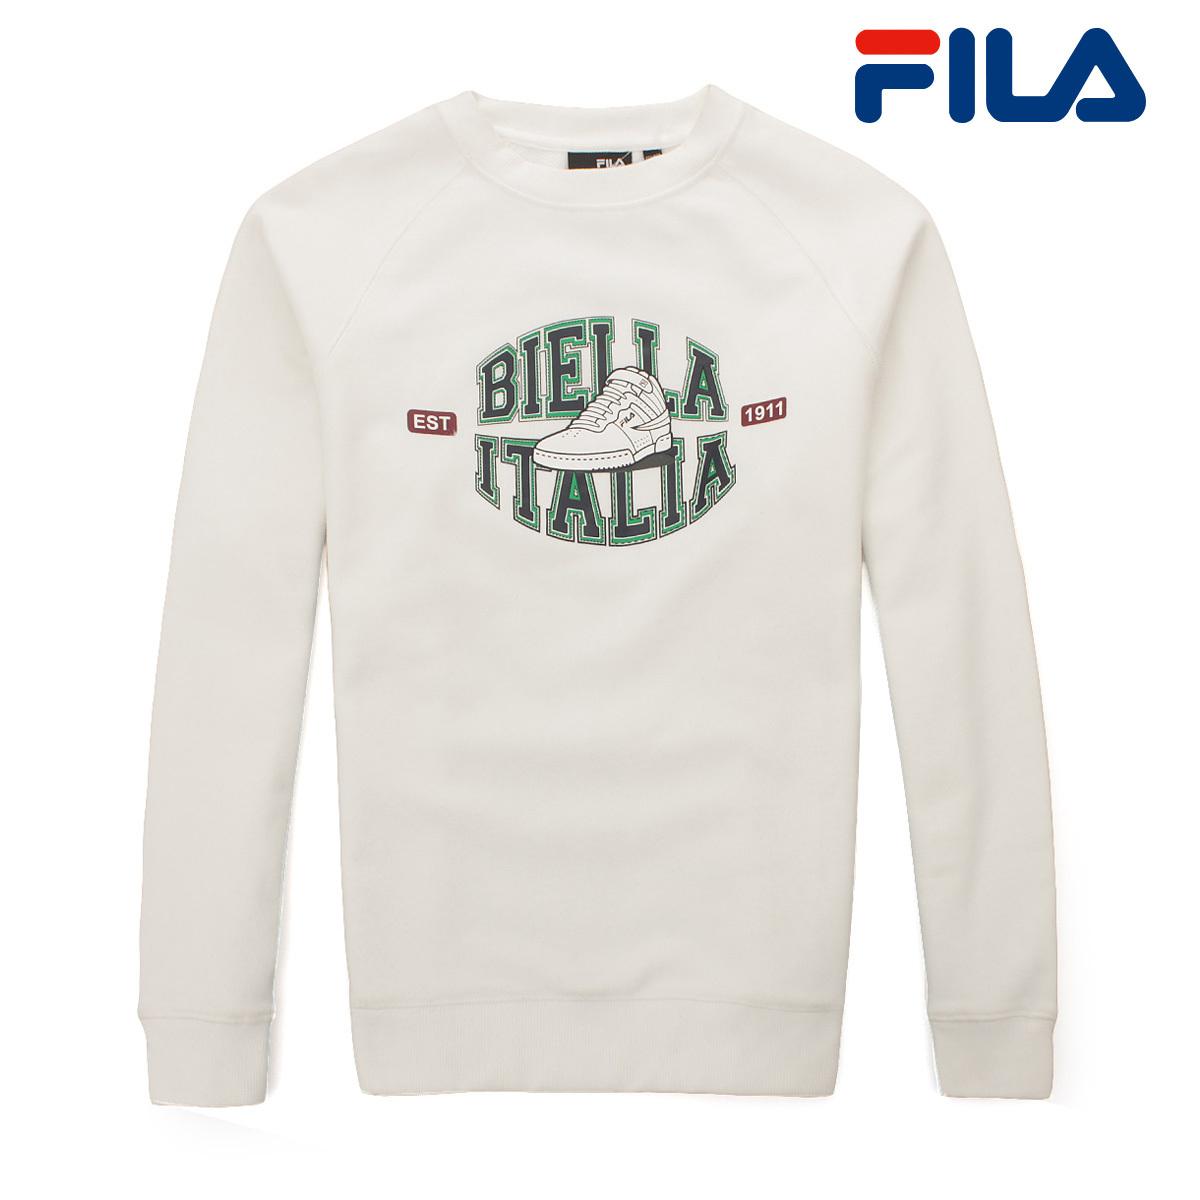 Спортивная толстовка Fila 6043201/2 6043201-2 Для мужчин Пуловер 100 Осень 2010